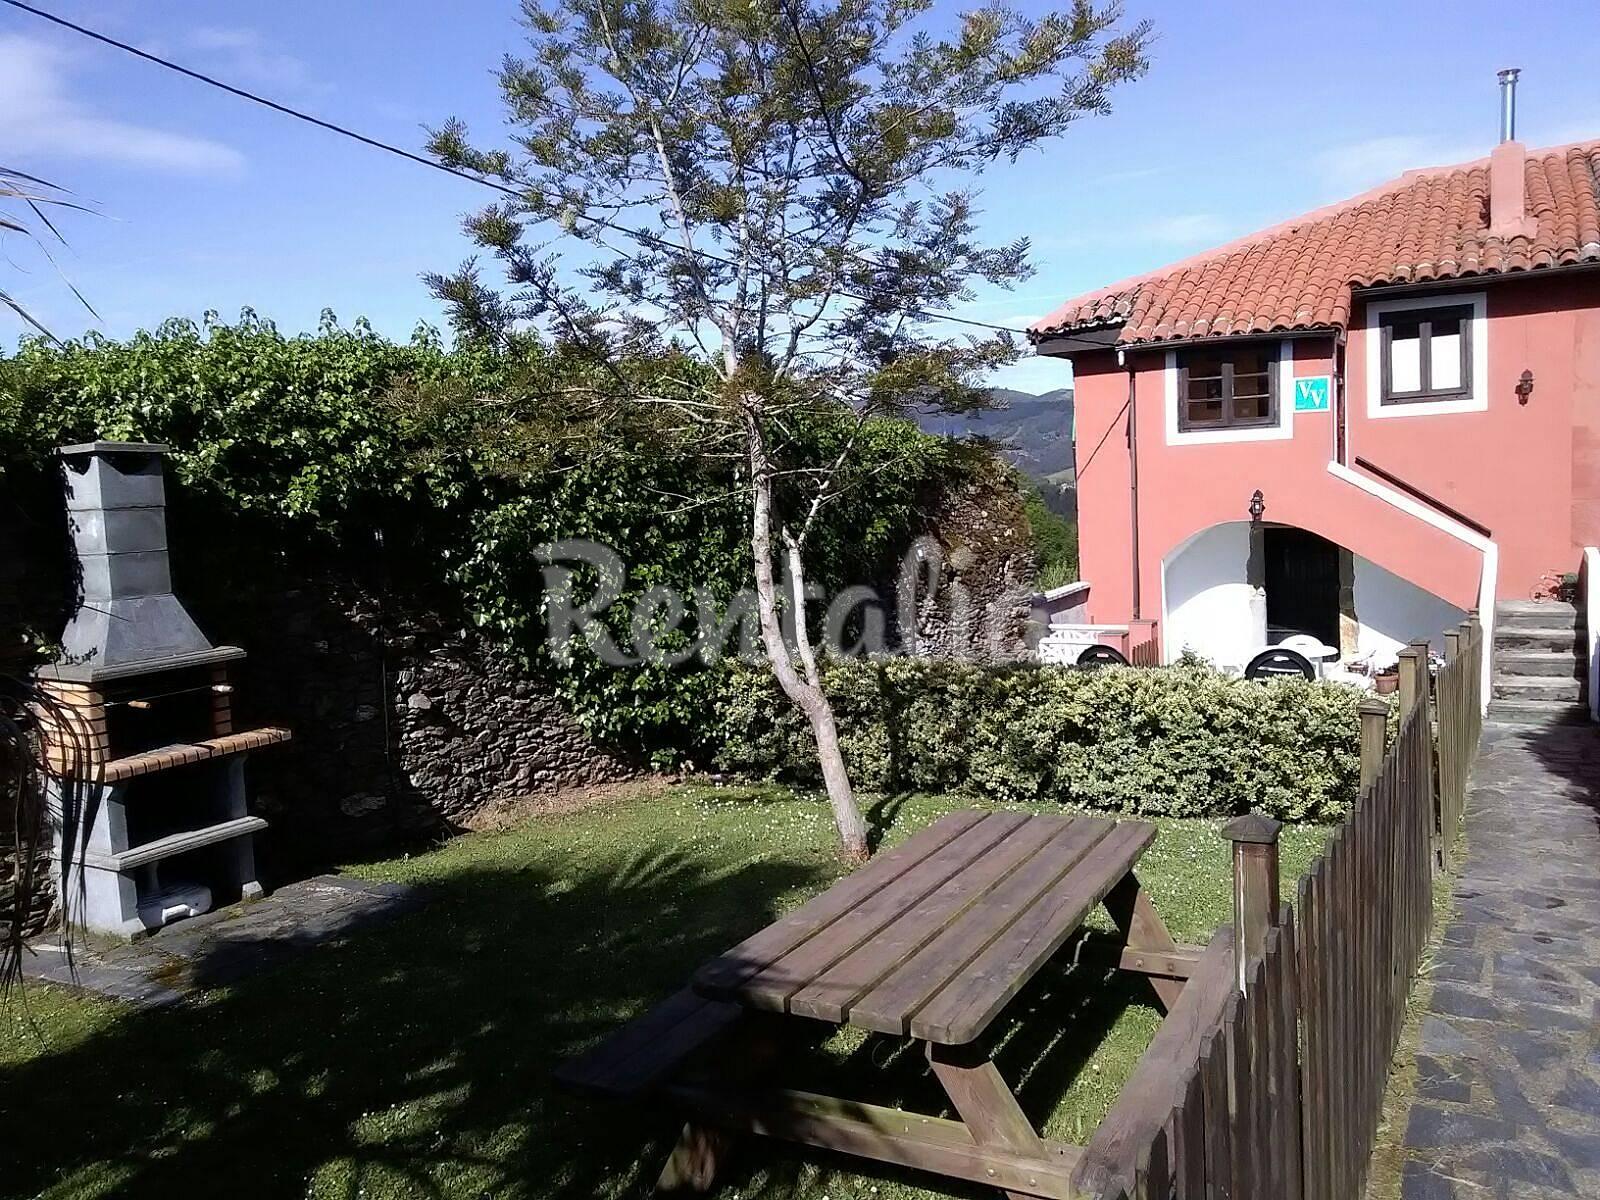 Casa con jard n san cristobal cudillero asturias for Casa jardin asturias